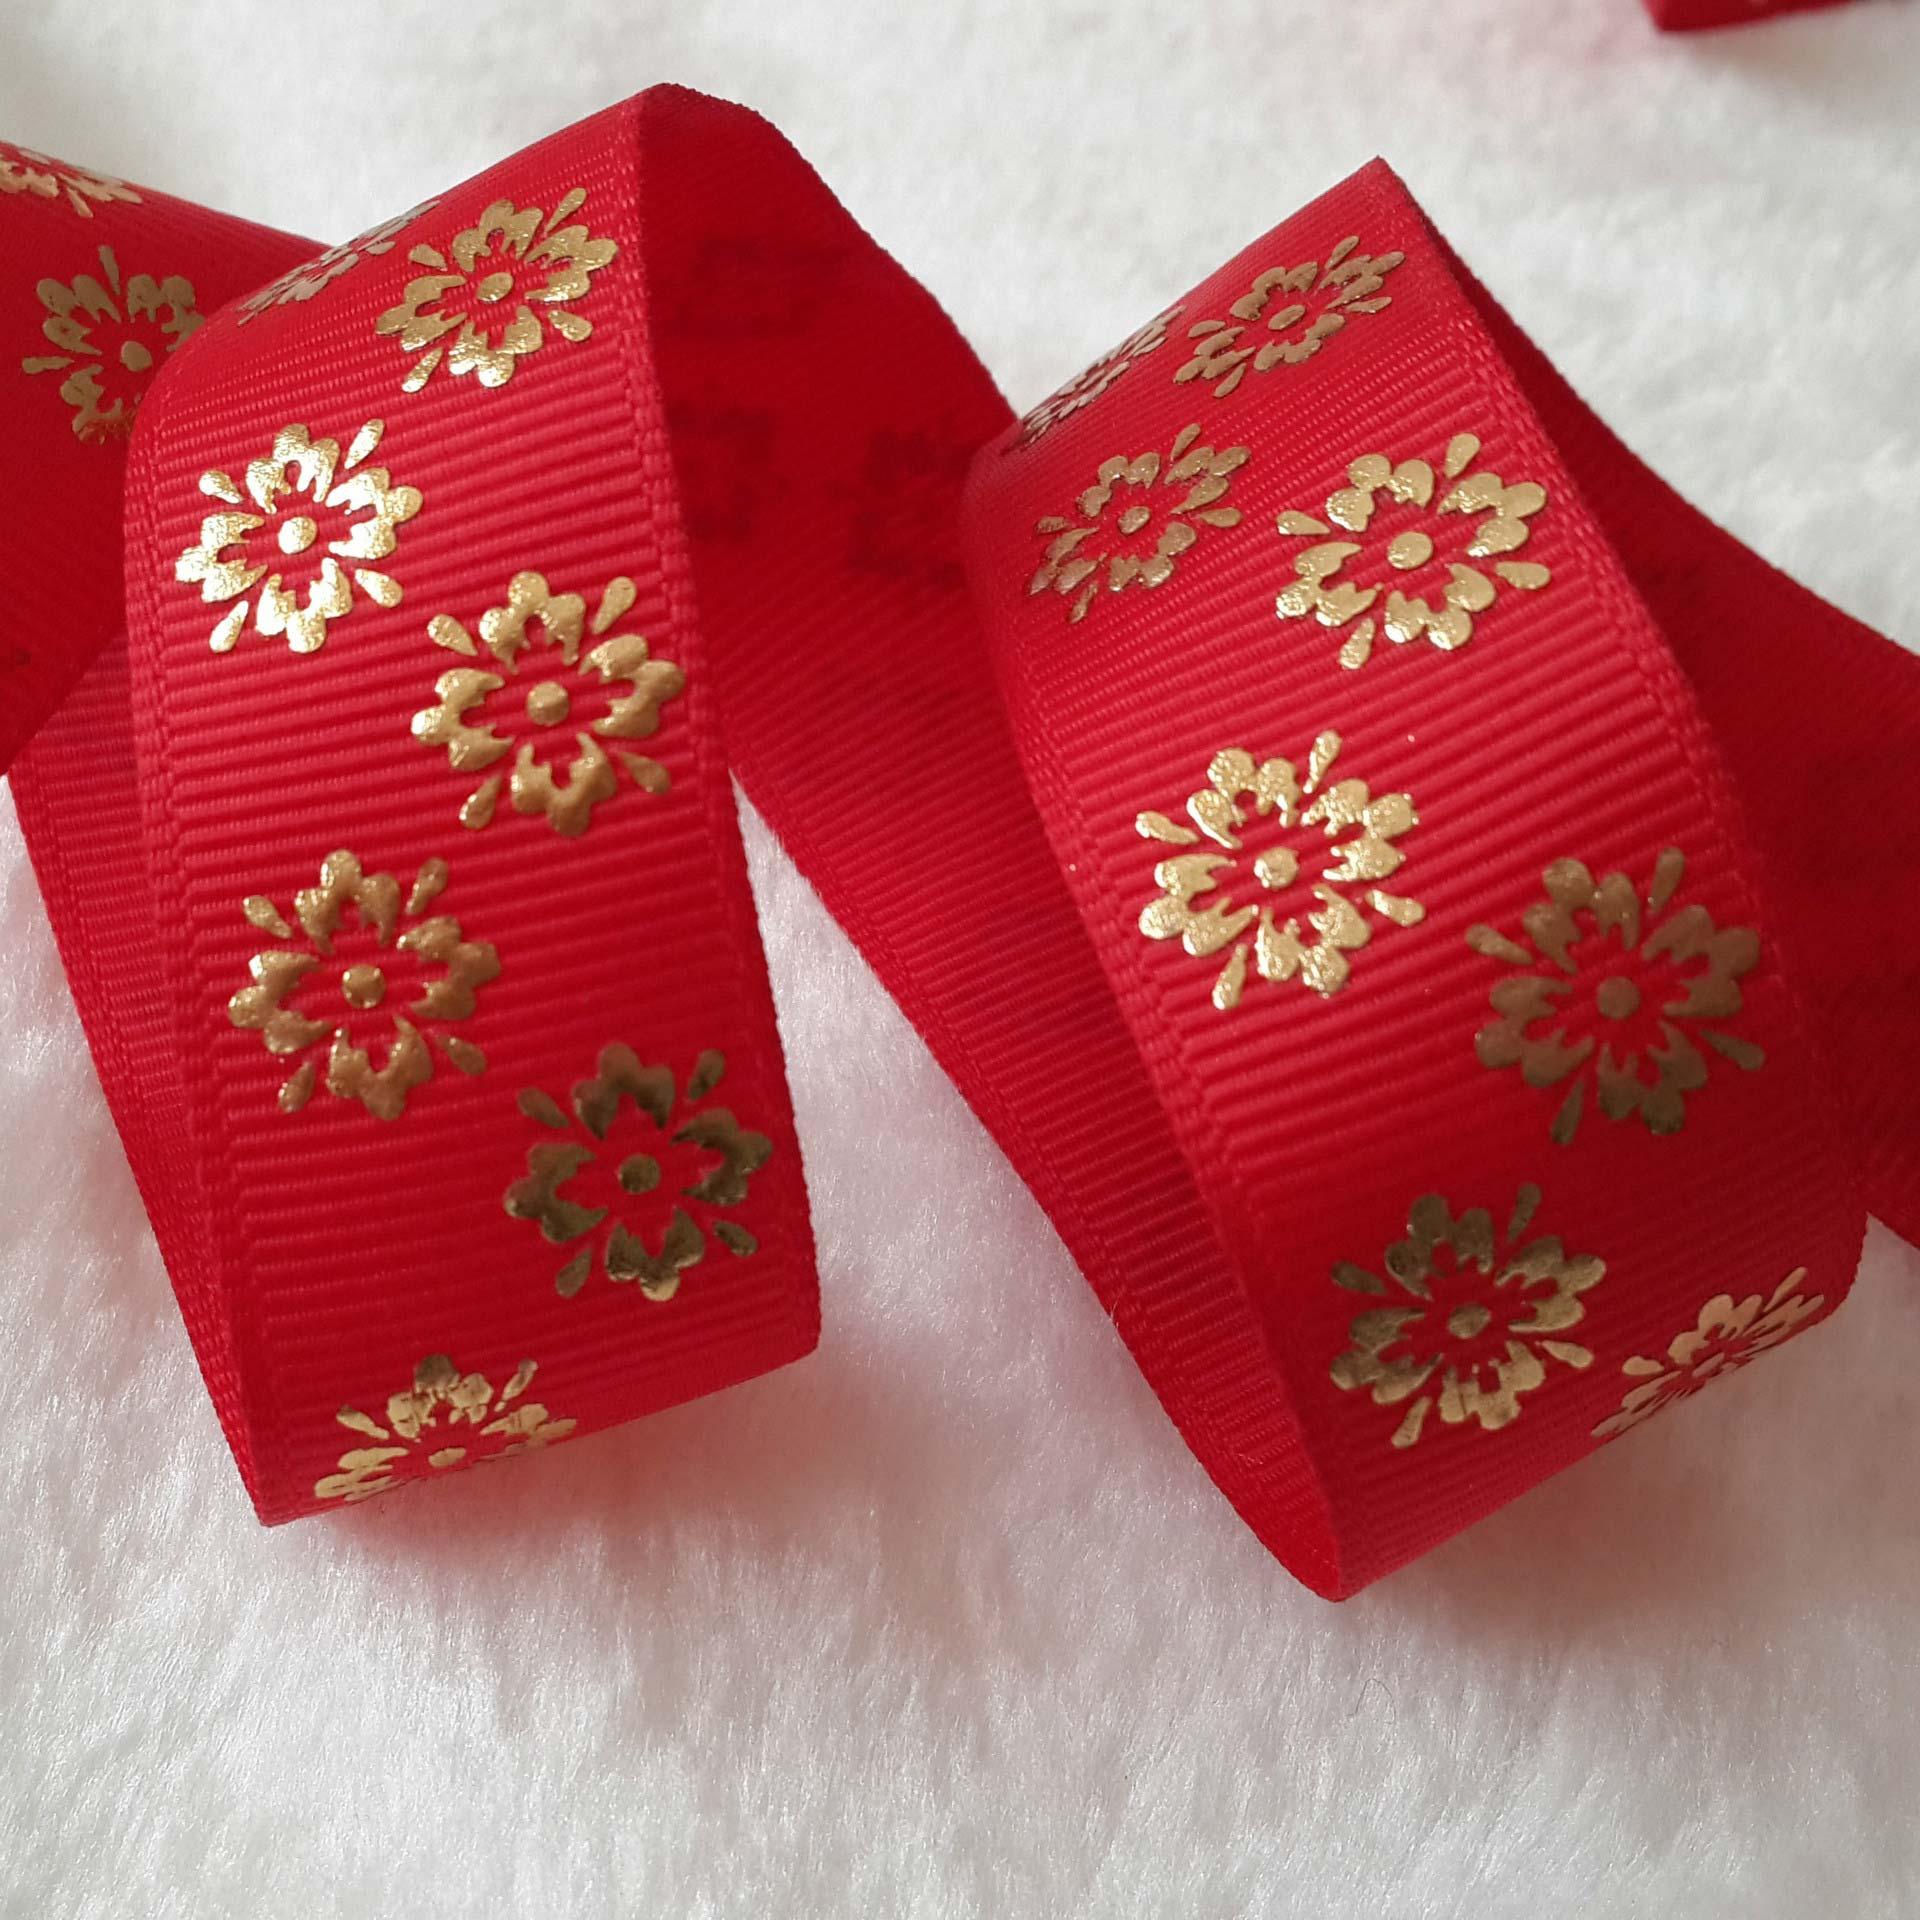 22MM发泡烫金 凹凸感金箔小花织带涤纶缎带丝带商标定做罗纹带